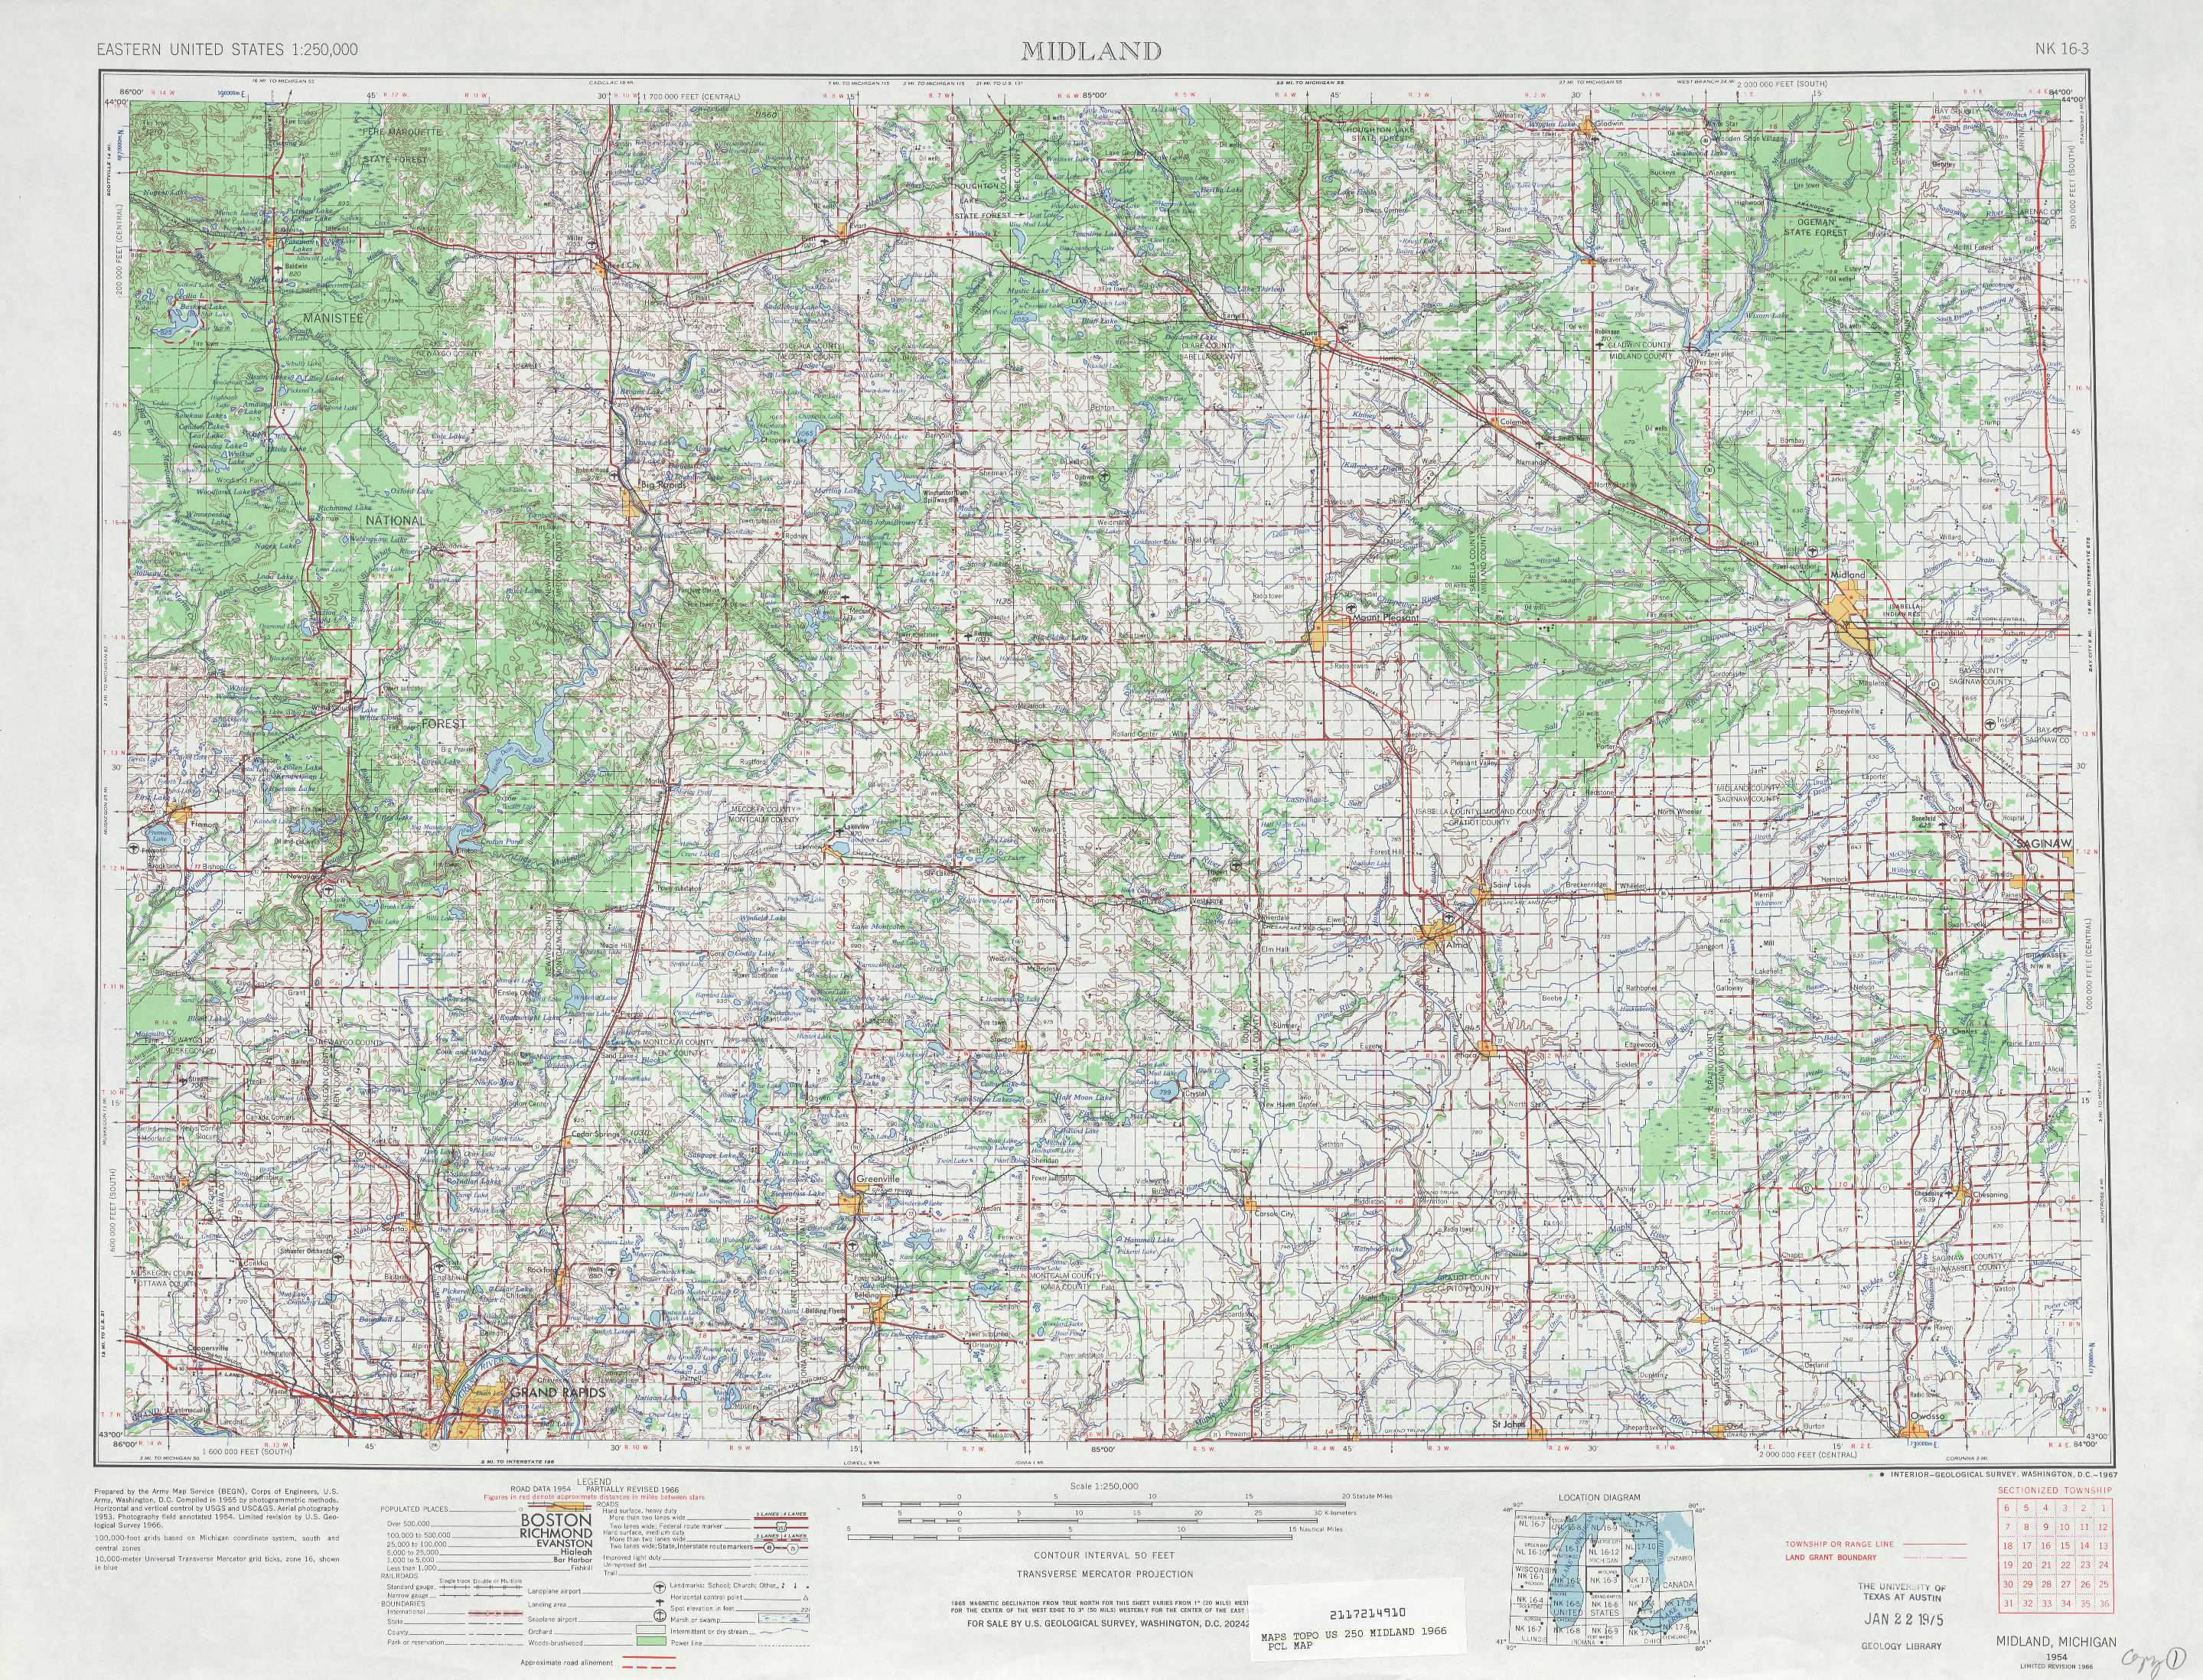 Midland Topographic Maps Mi Usgs Topo Quad 43084a1 At 1 250 000 Scale